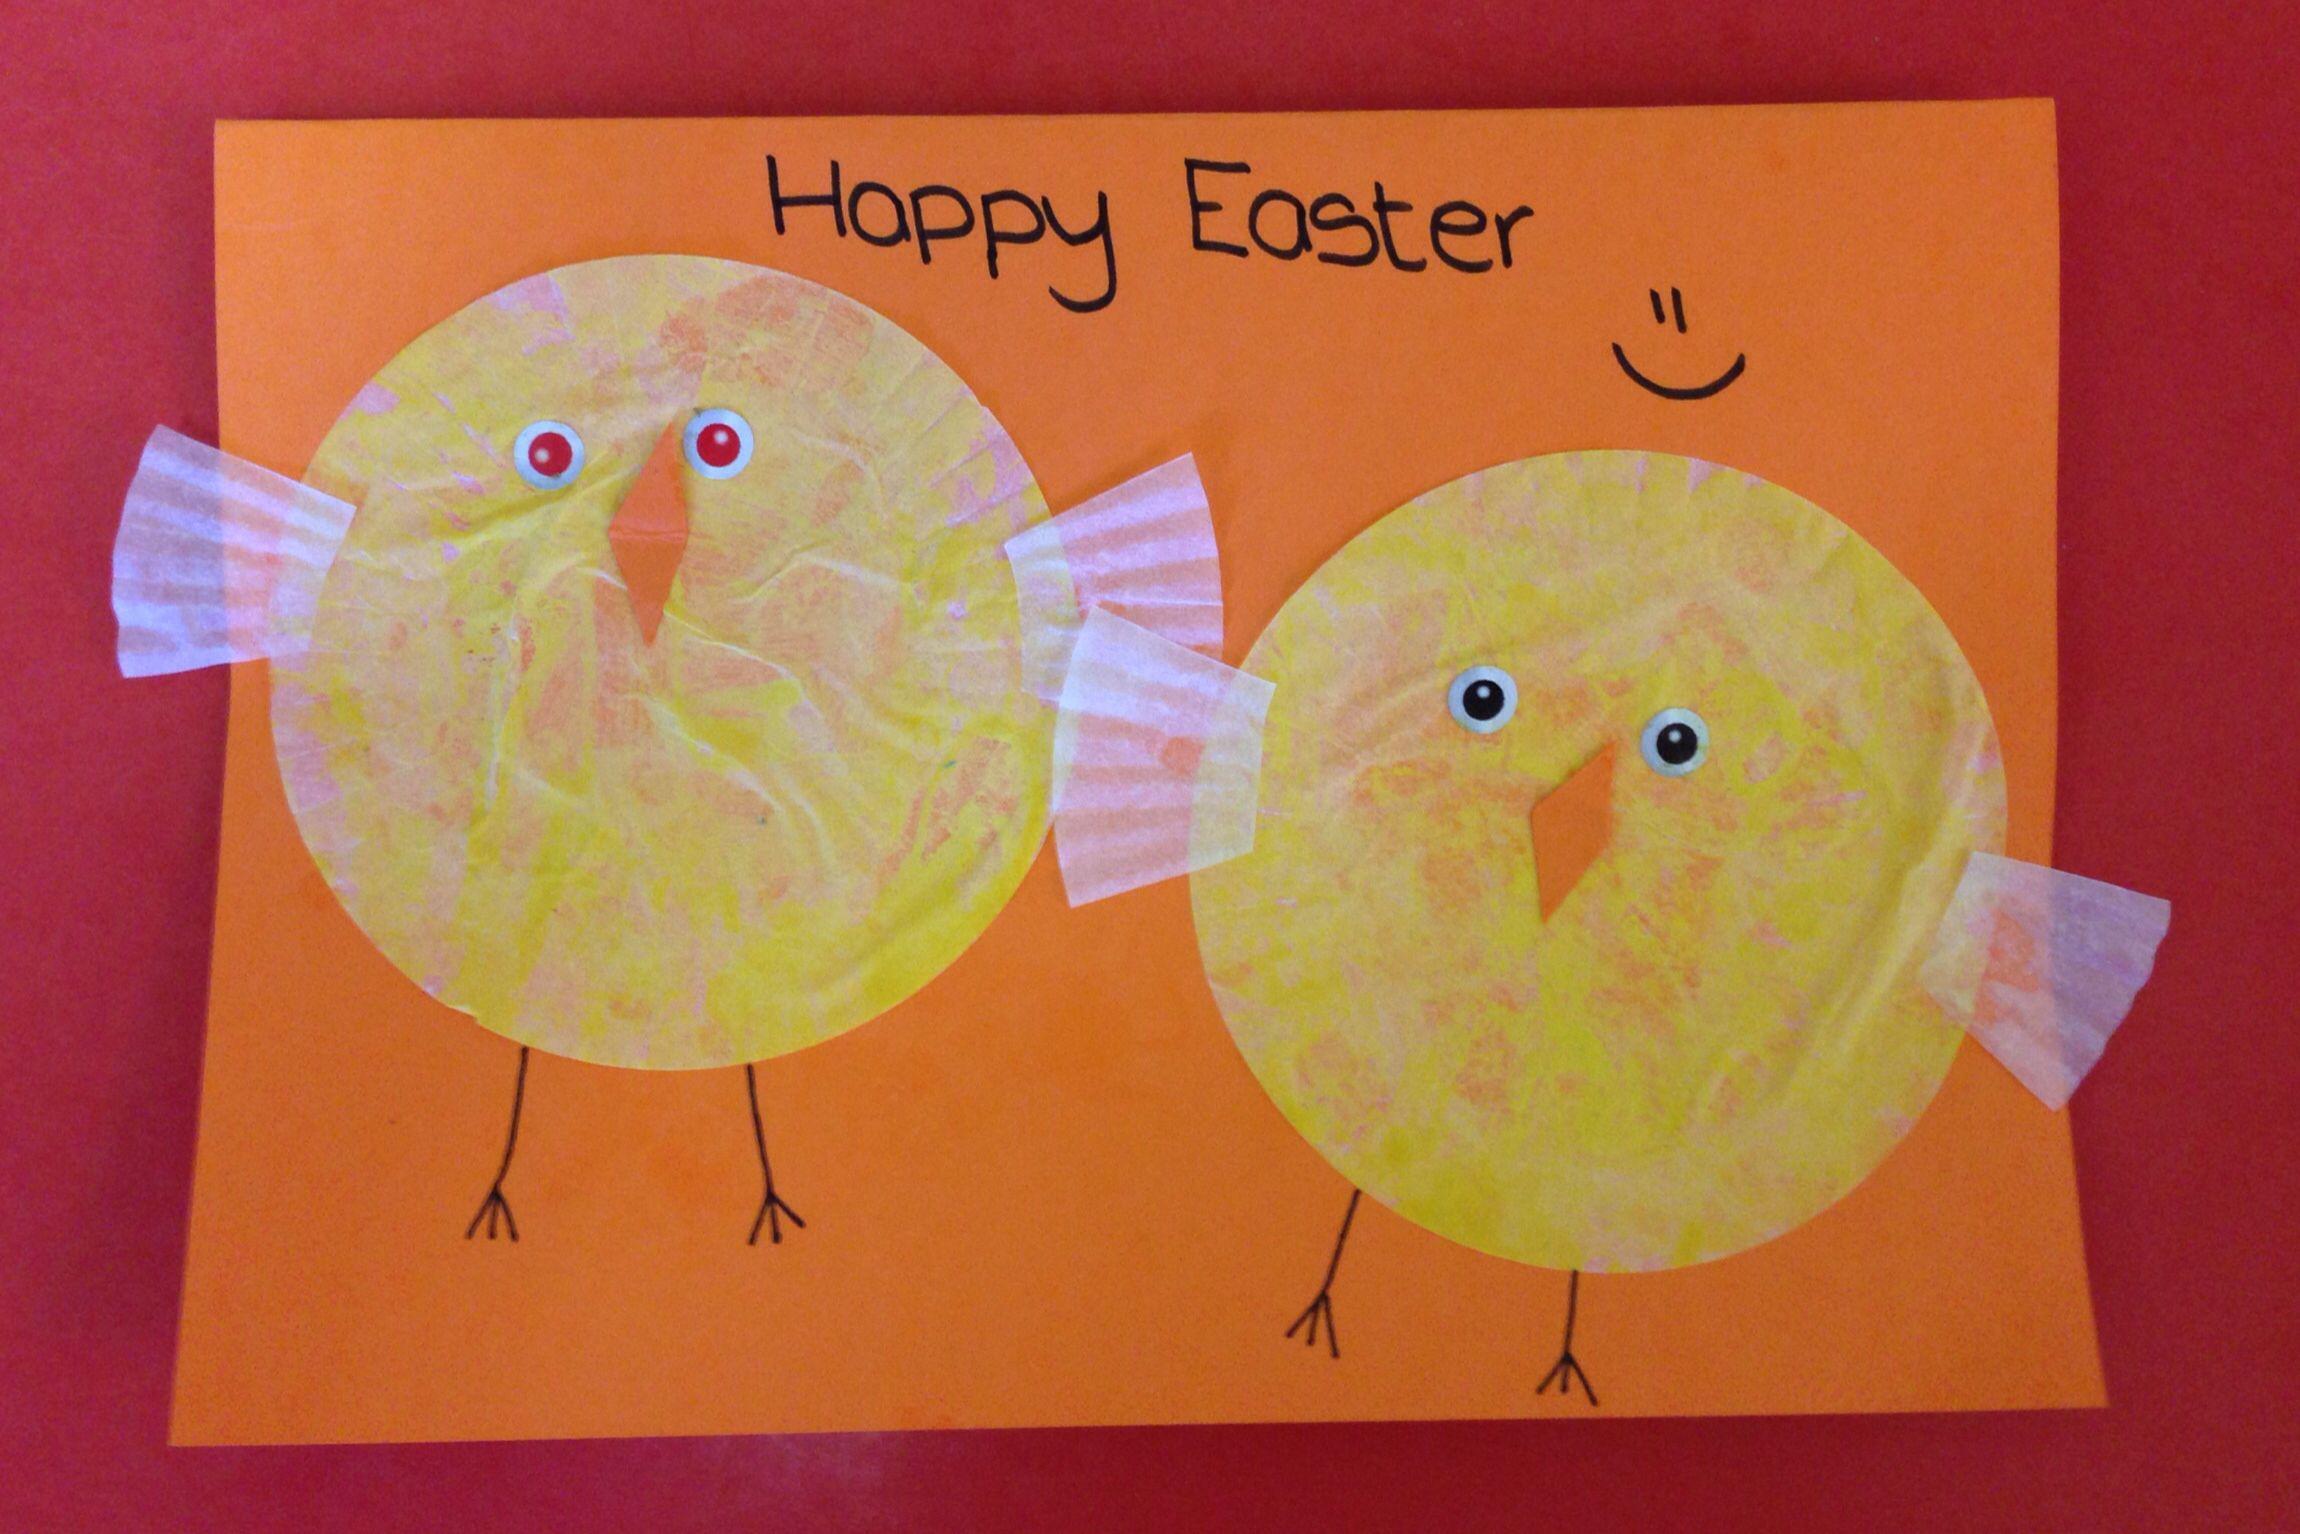 Montessori Preschool Easter Card The Children Painted Bun